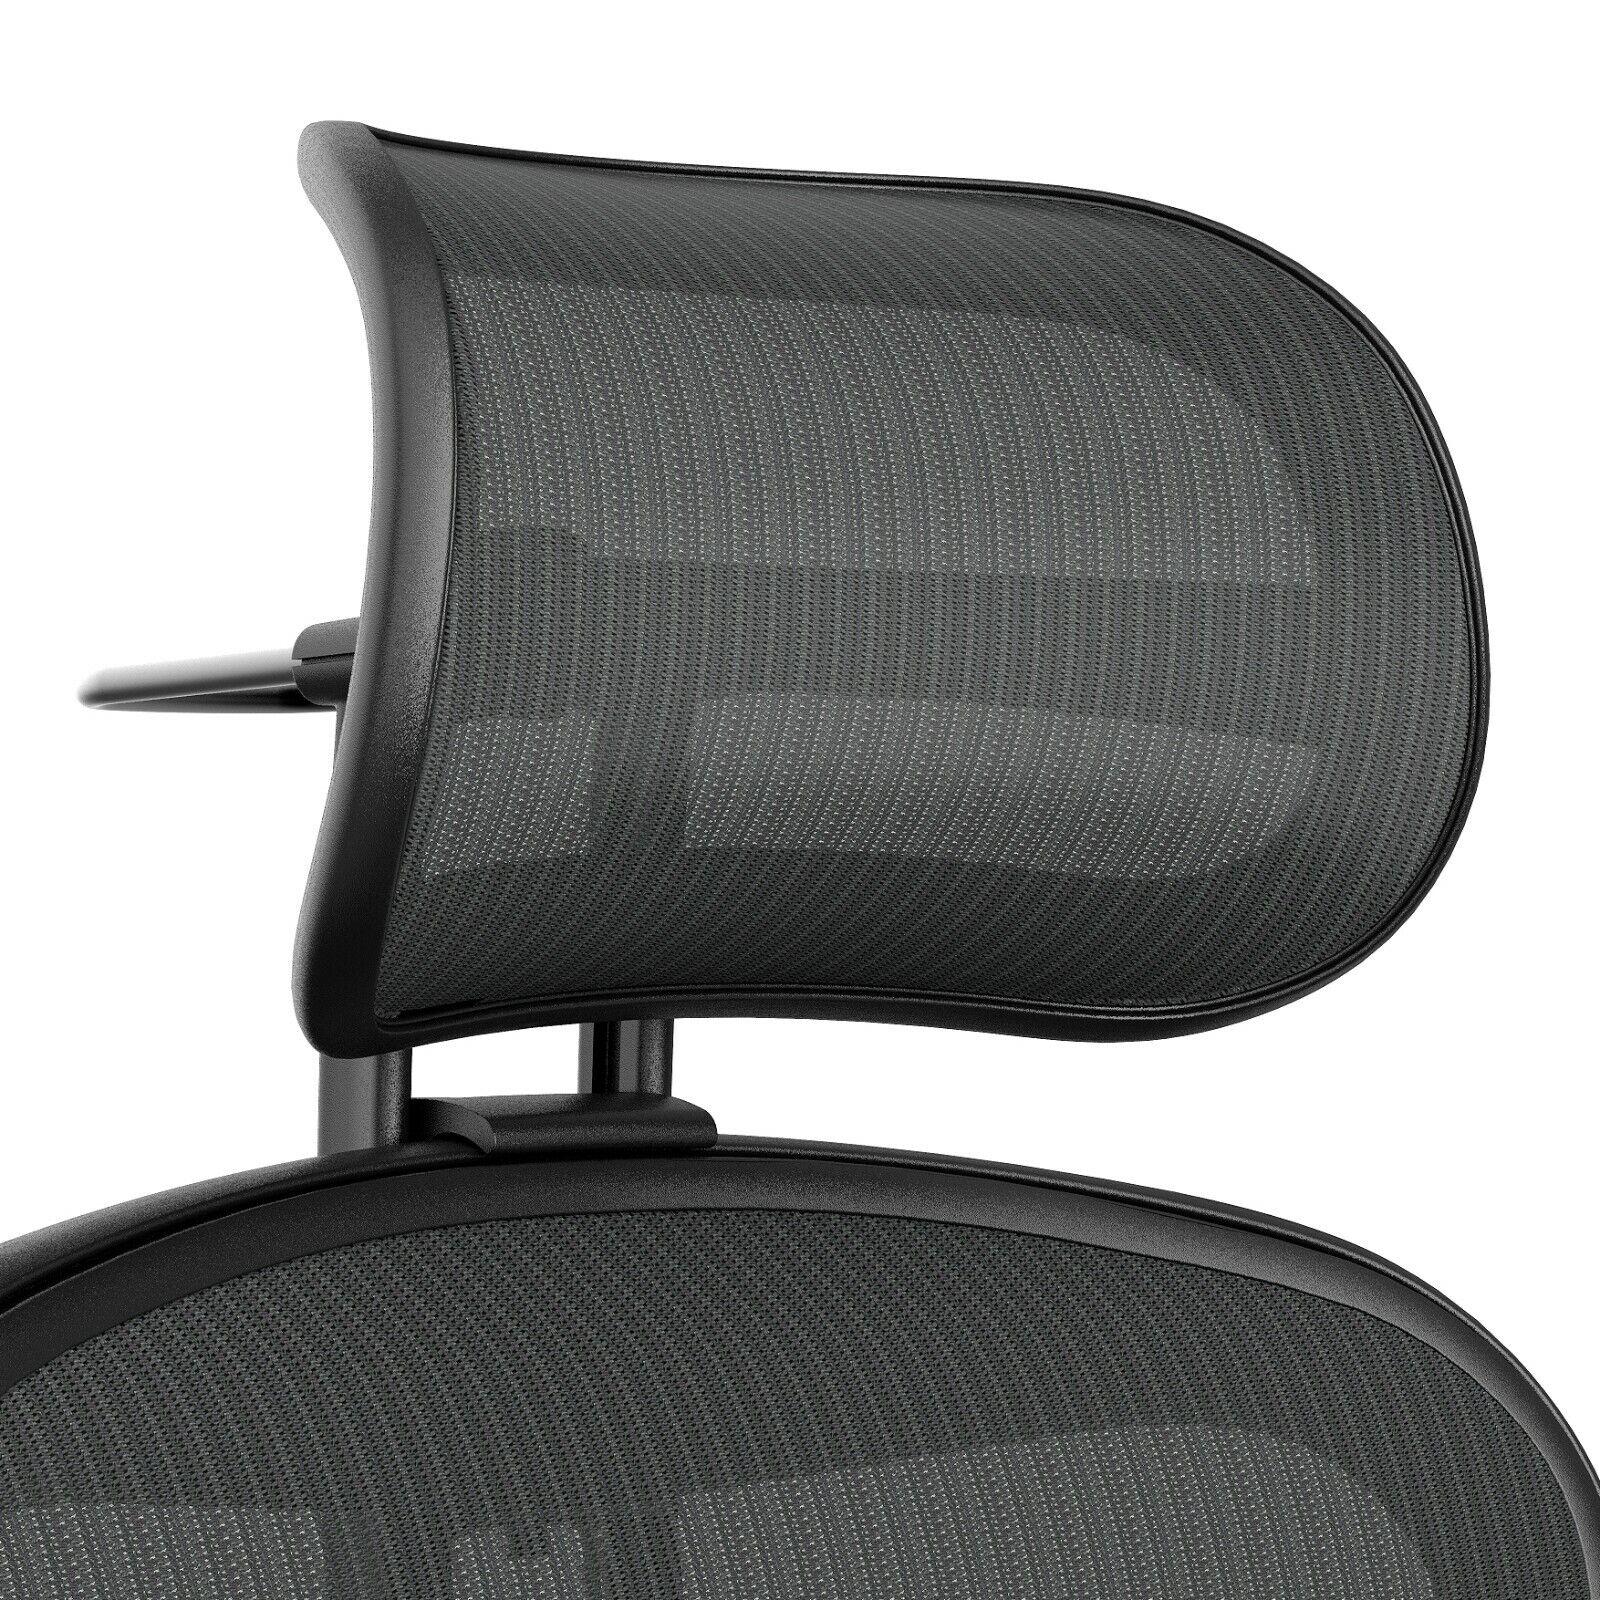 Atlas Suspension Headrest for Herman Miller Aeron Chair - Remastered  Graphite